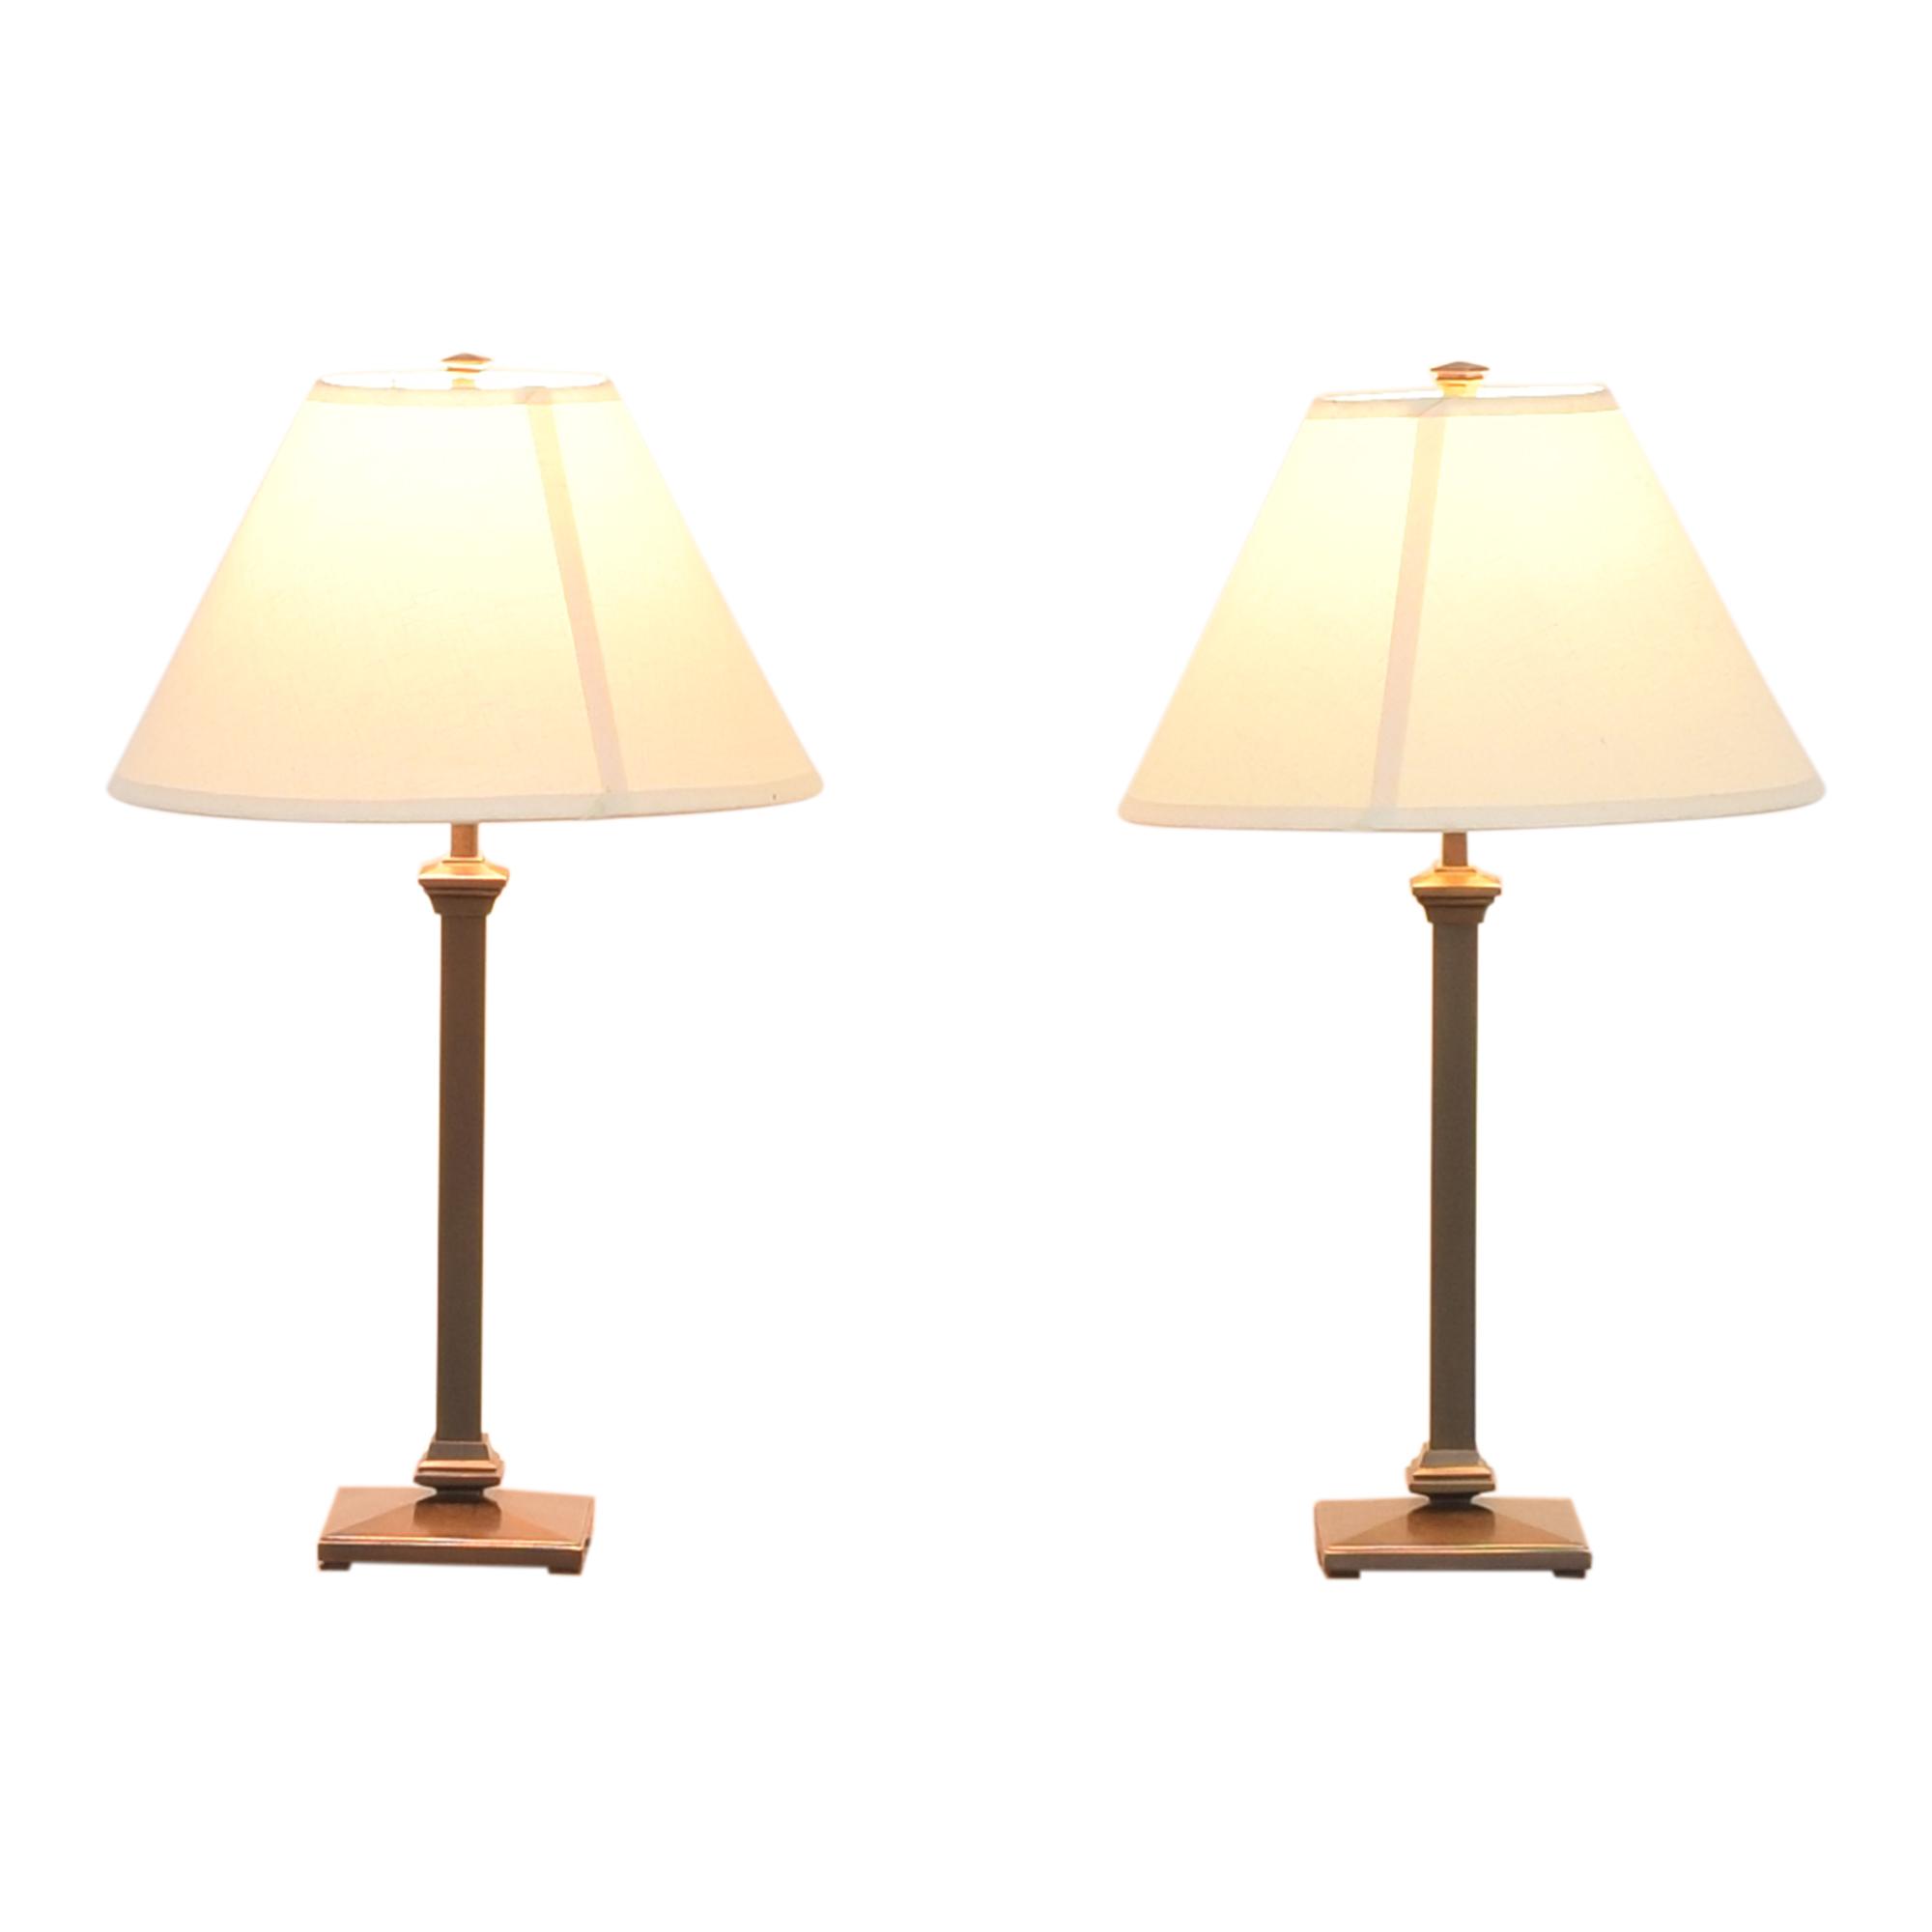 Restoration Hardware Small Table Lamps Restoration Hardware